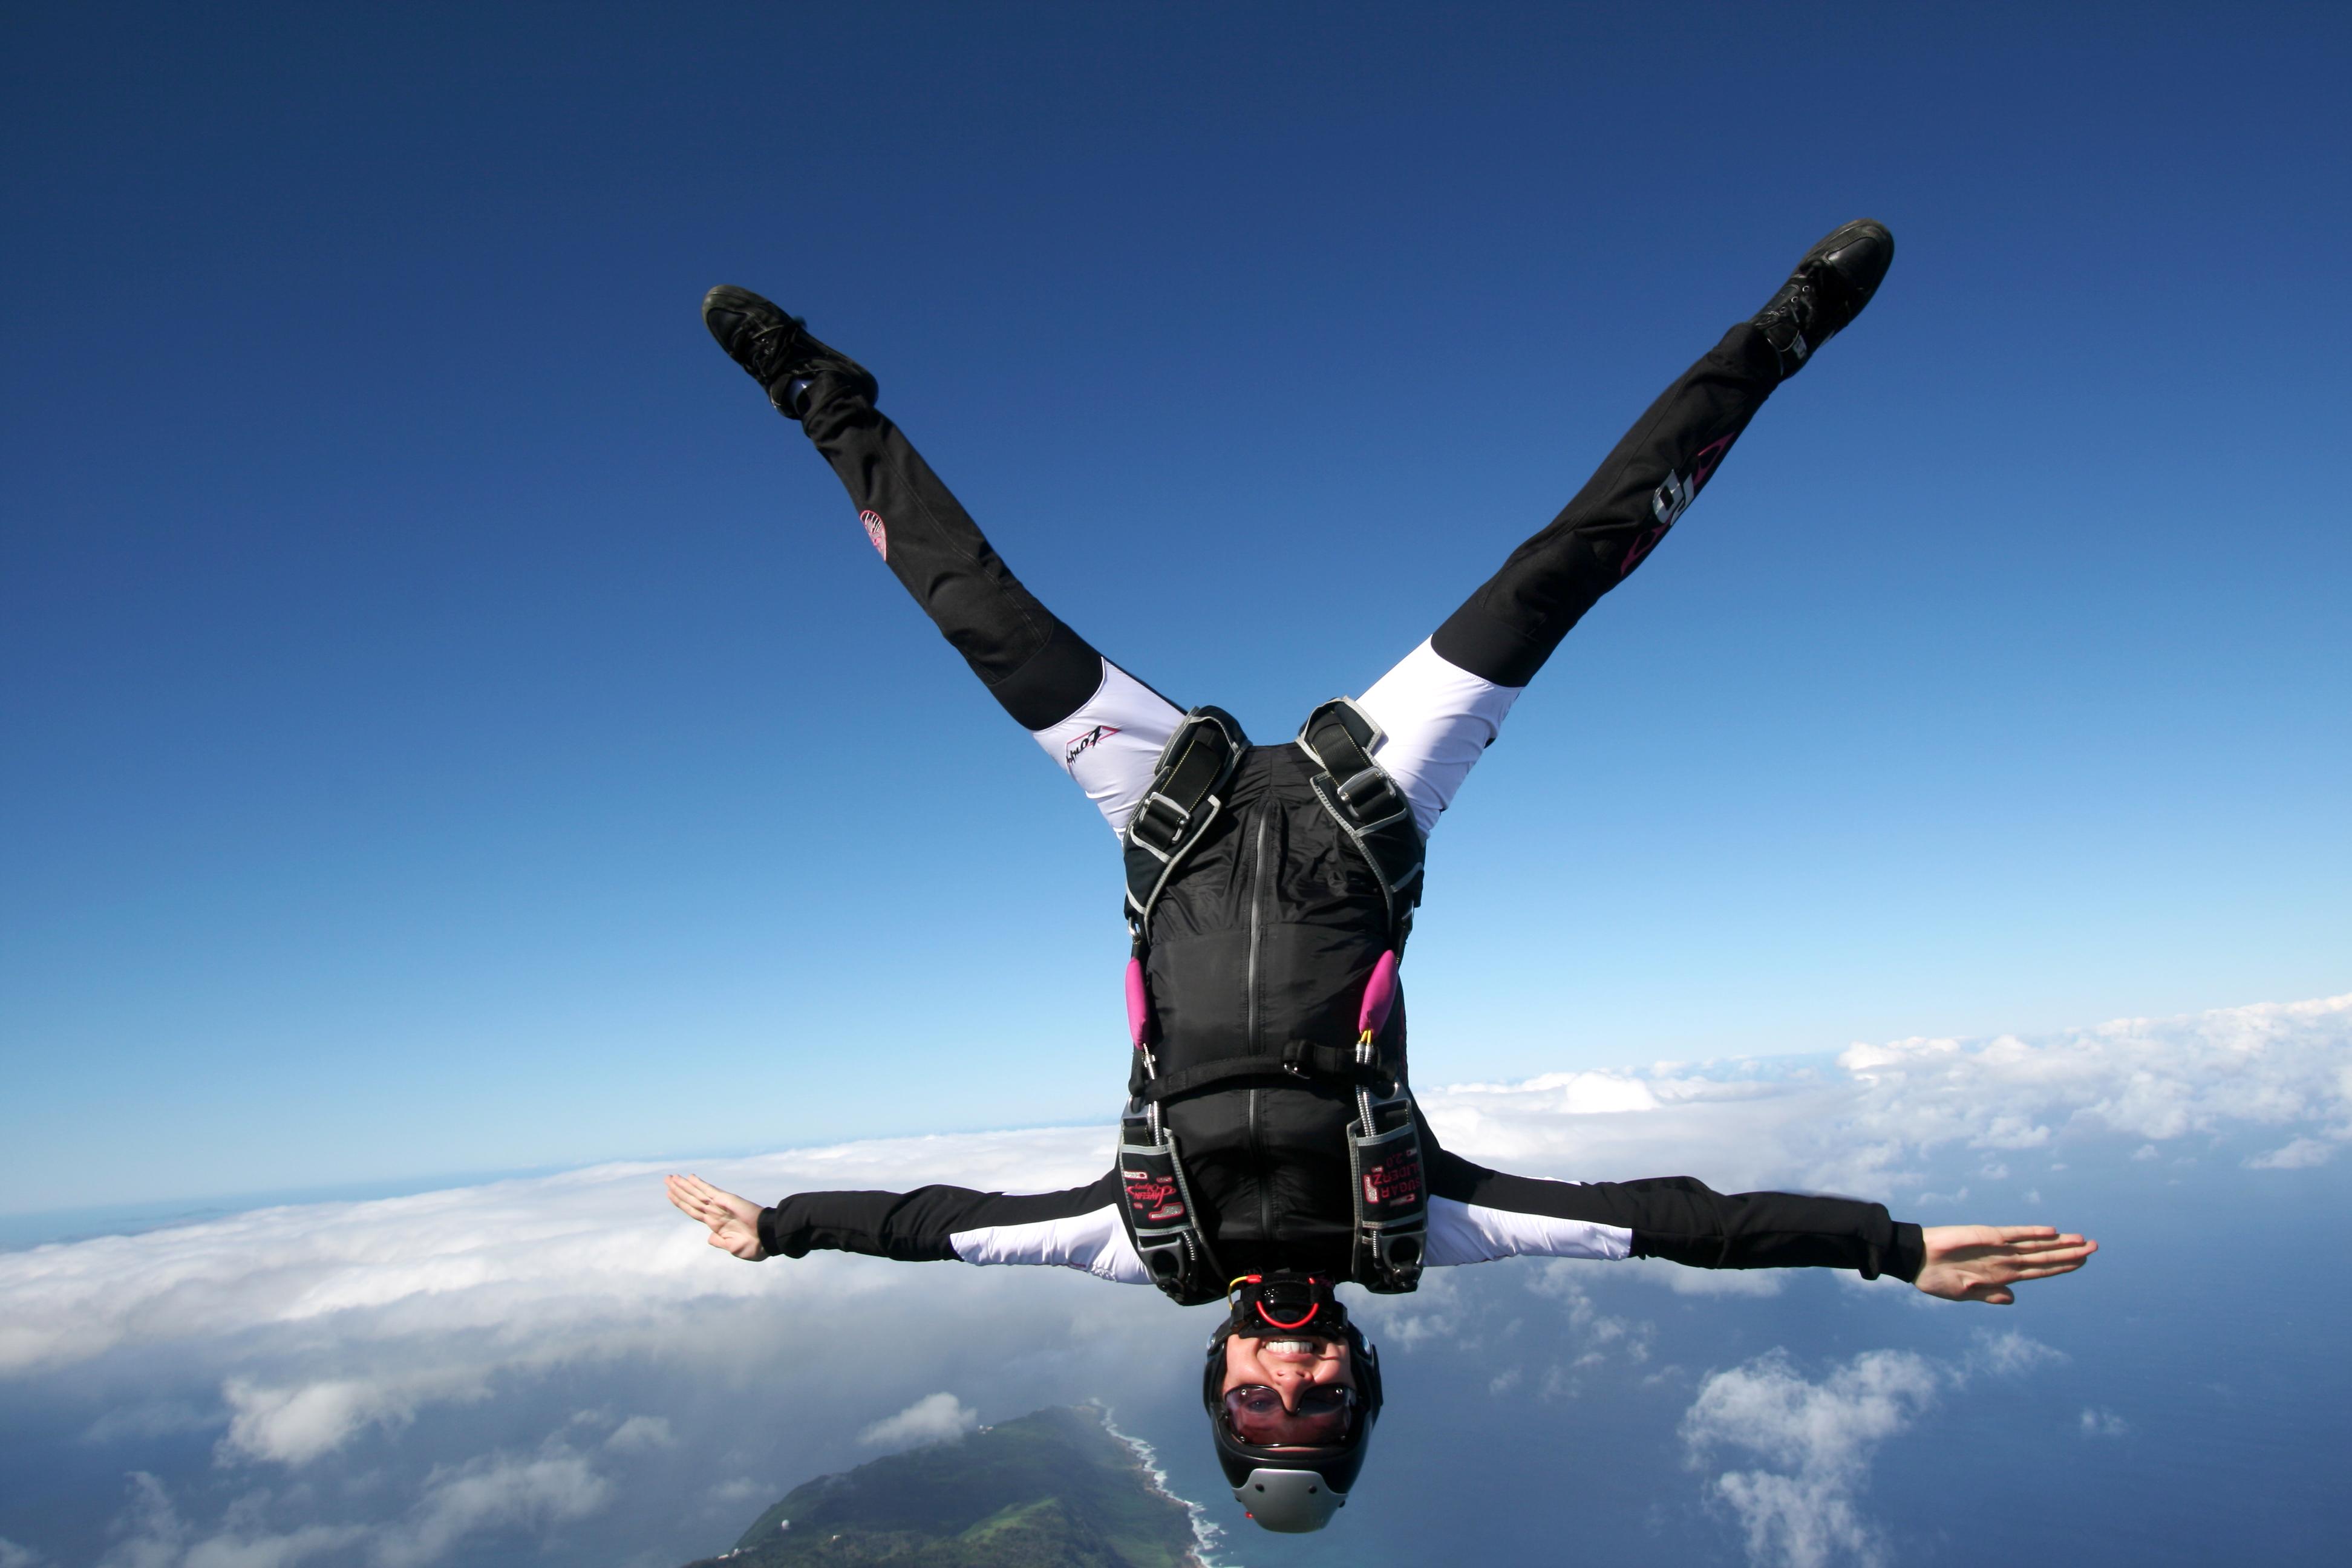 Skydive Free Fall Sports Wallpaper: Skydiving 4k Ultra HD Wallpaper